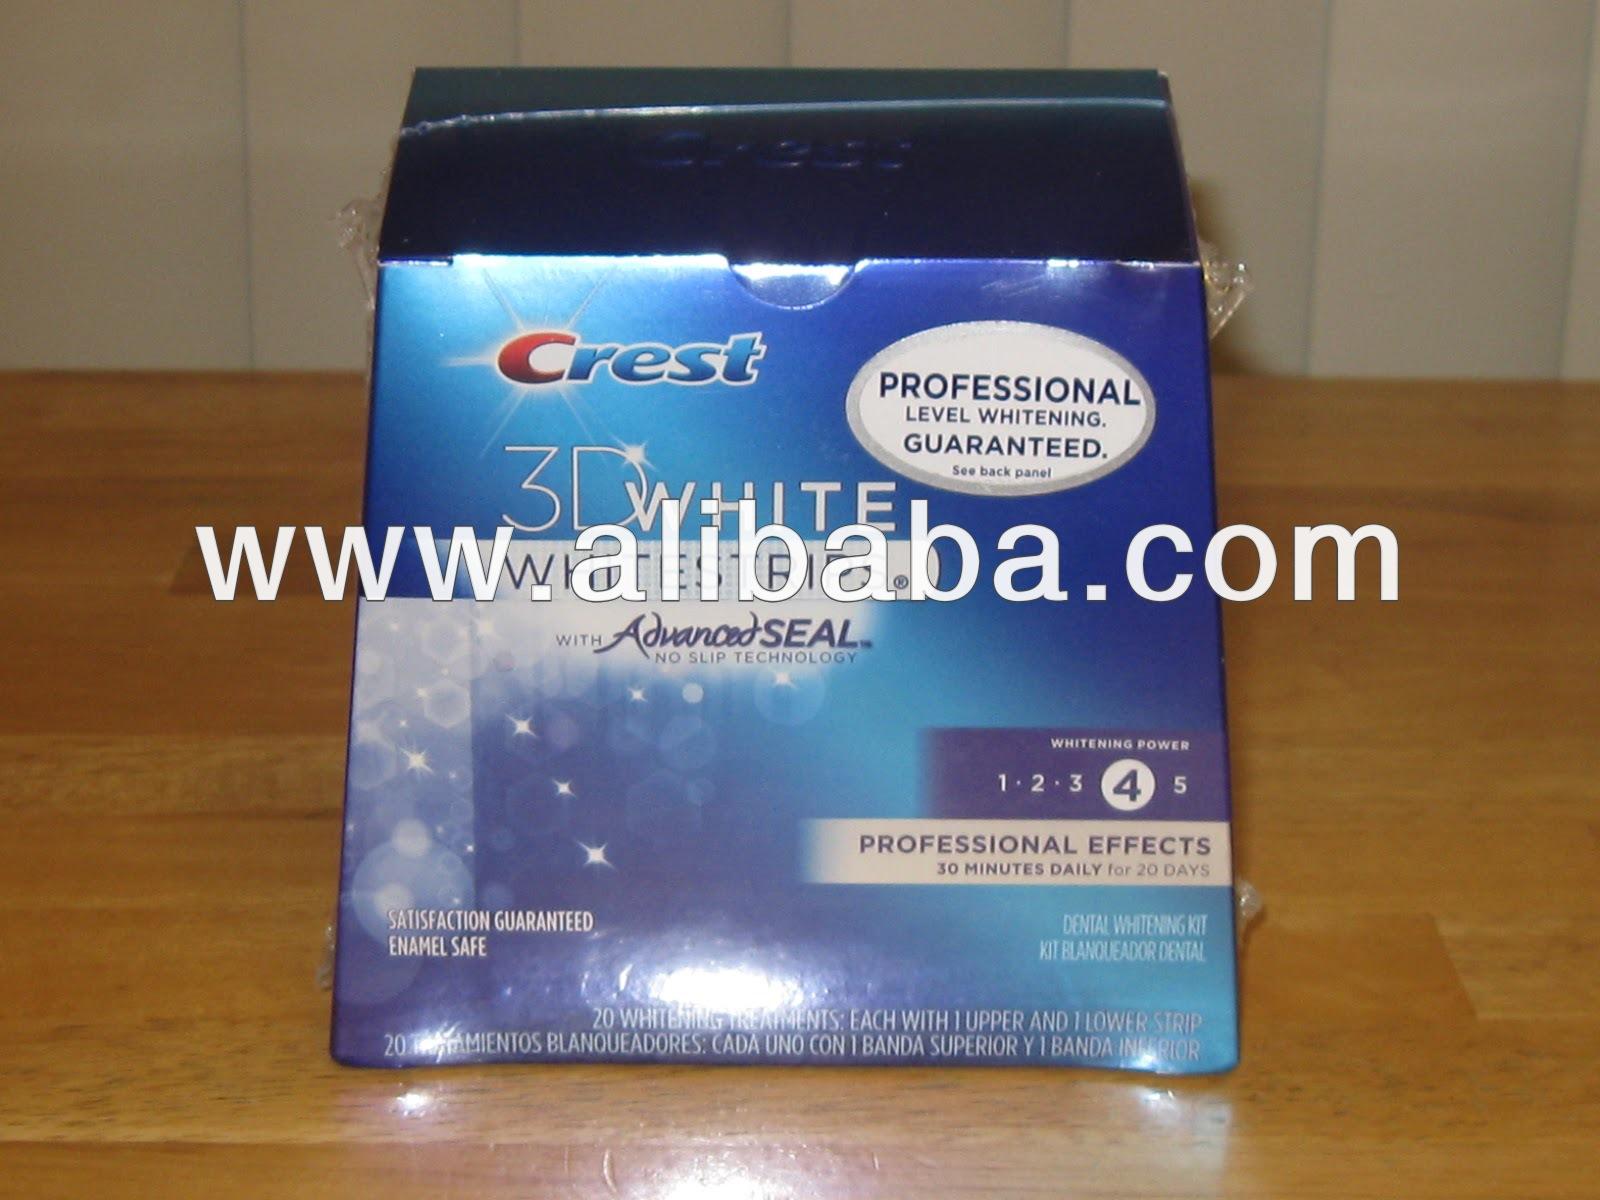 Crest 3D White Whitestrips Professional Effects, Enamel Safe 20 ct